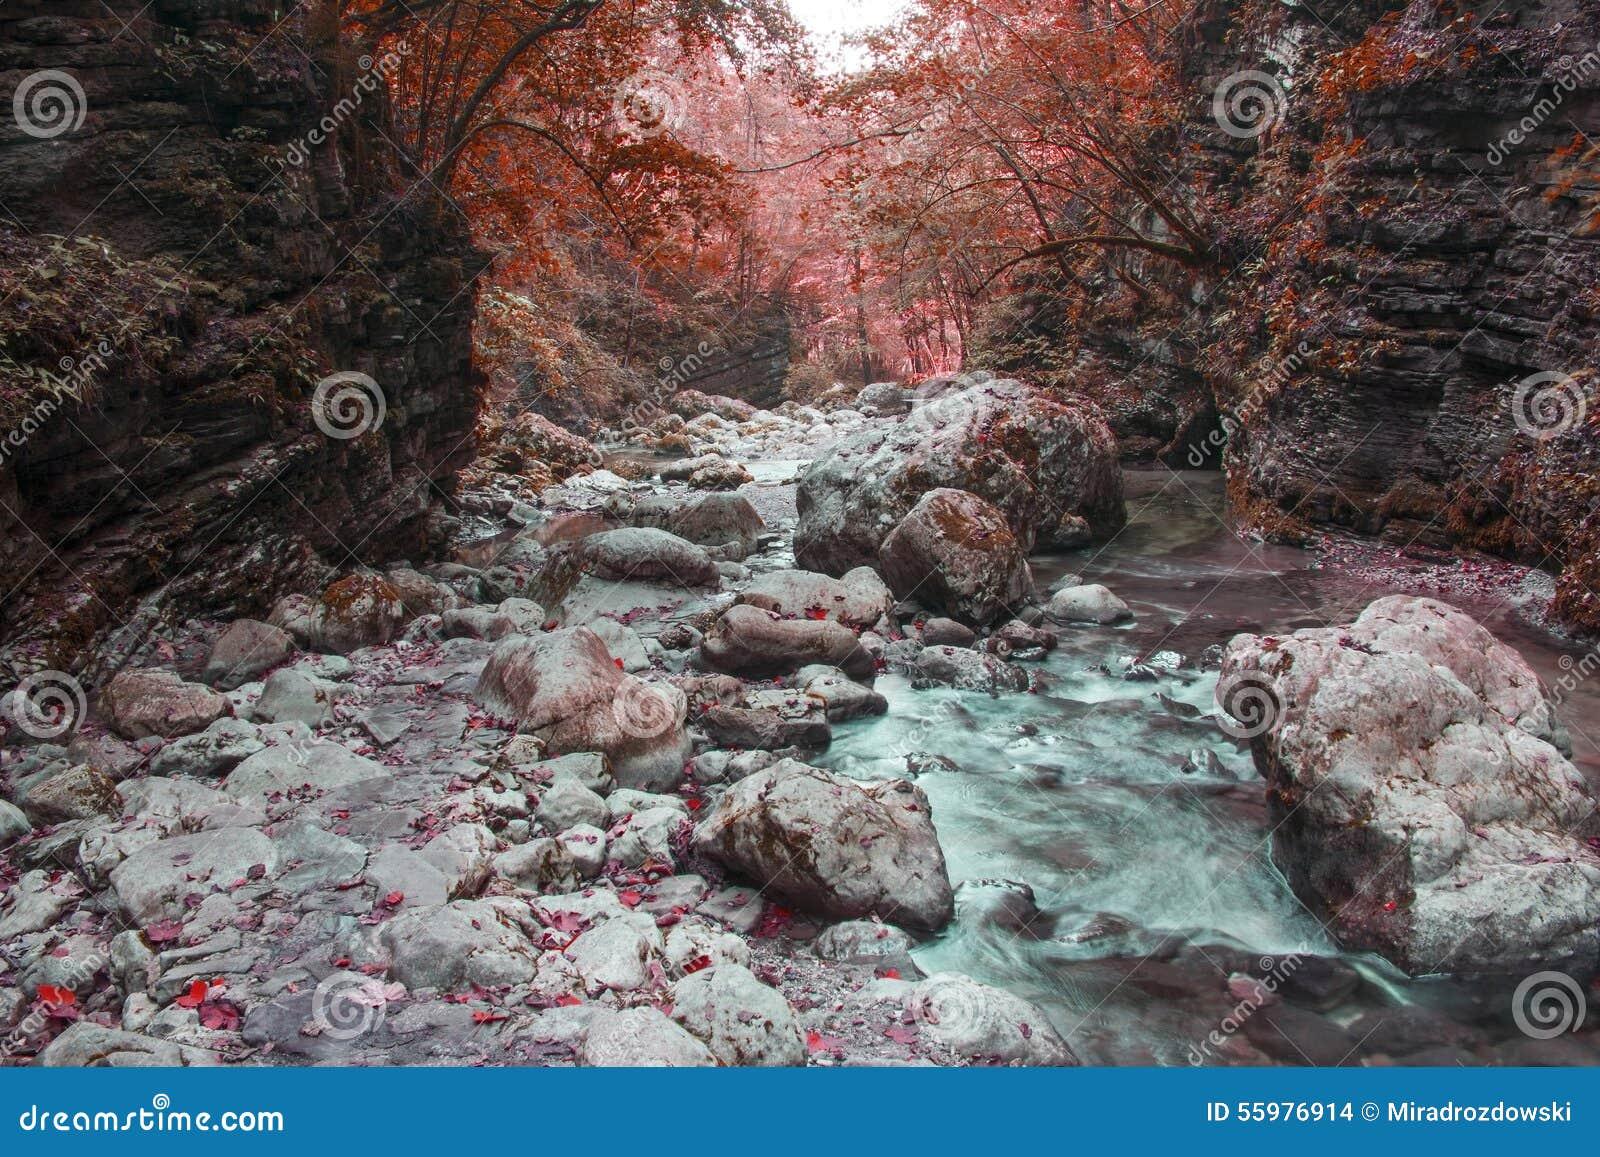 River stream in colorful autumn forest in Slovenia